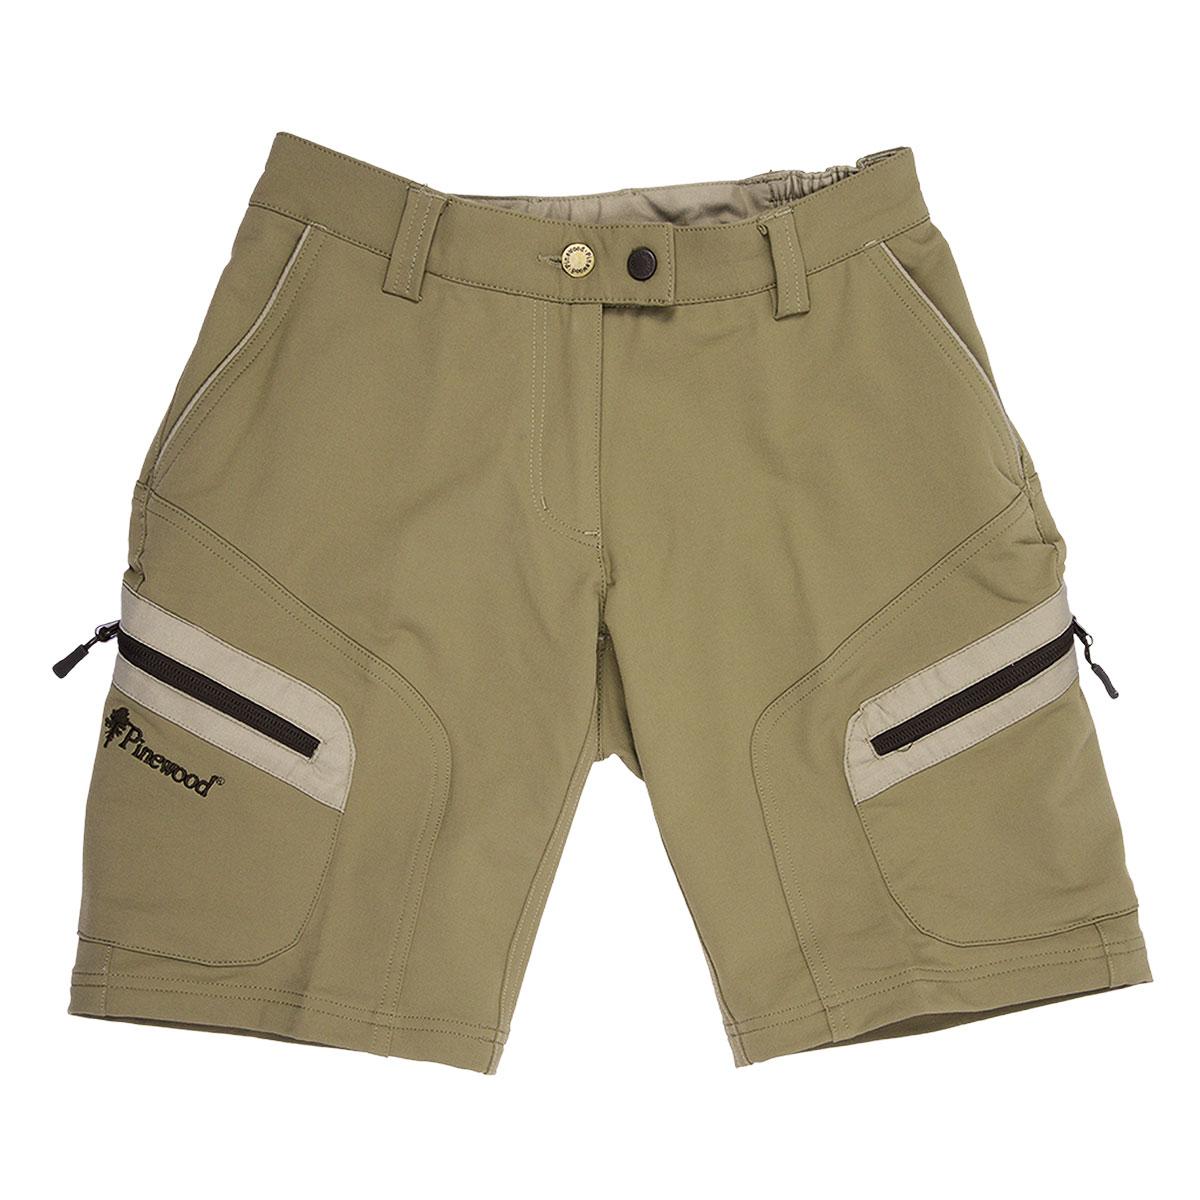 Pinewood Damen Wildmark Stretch Shorts khaki im Pareyshop